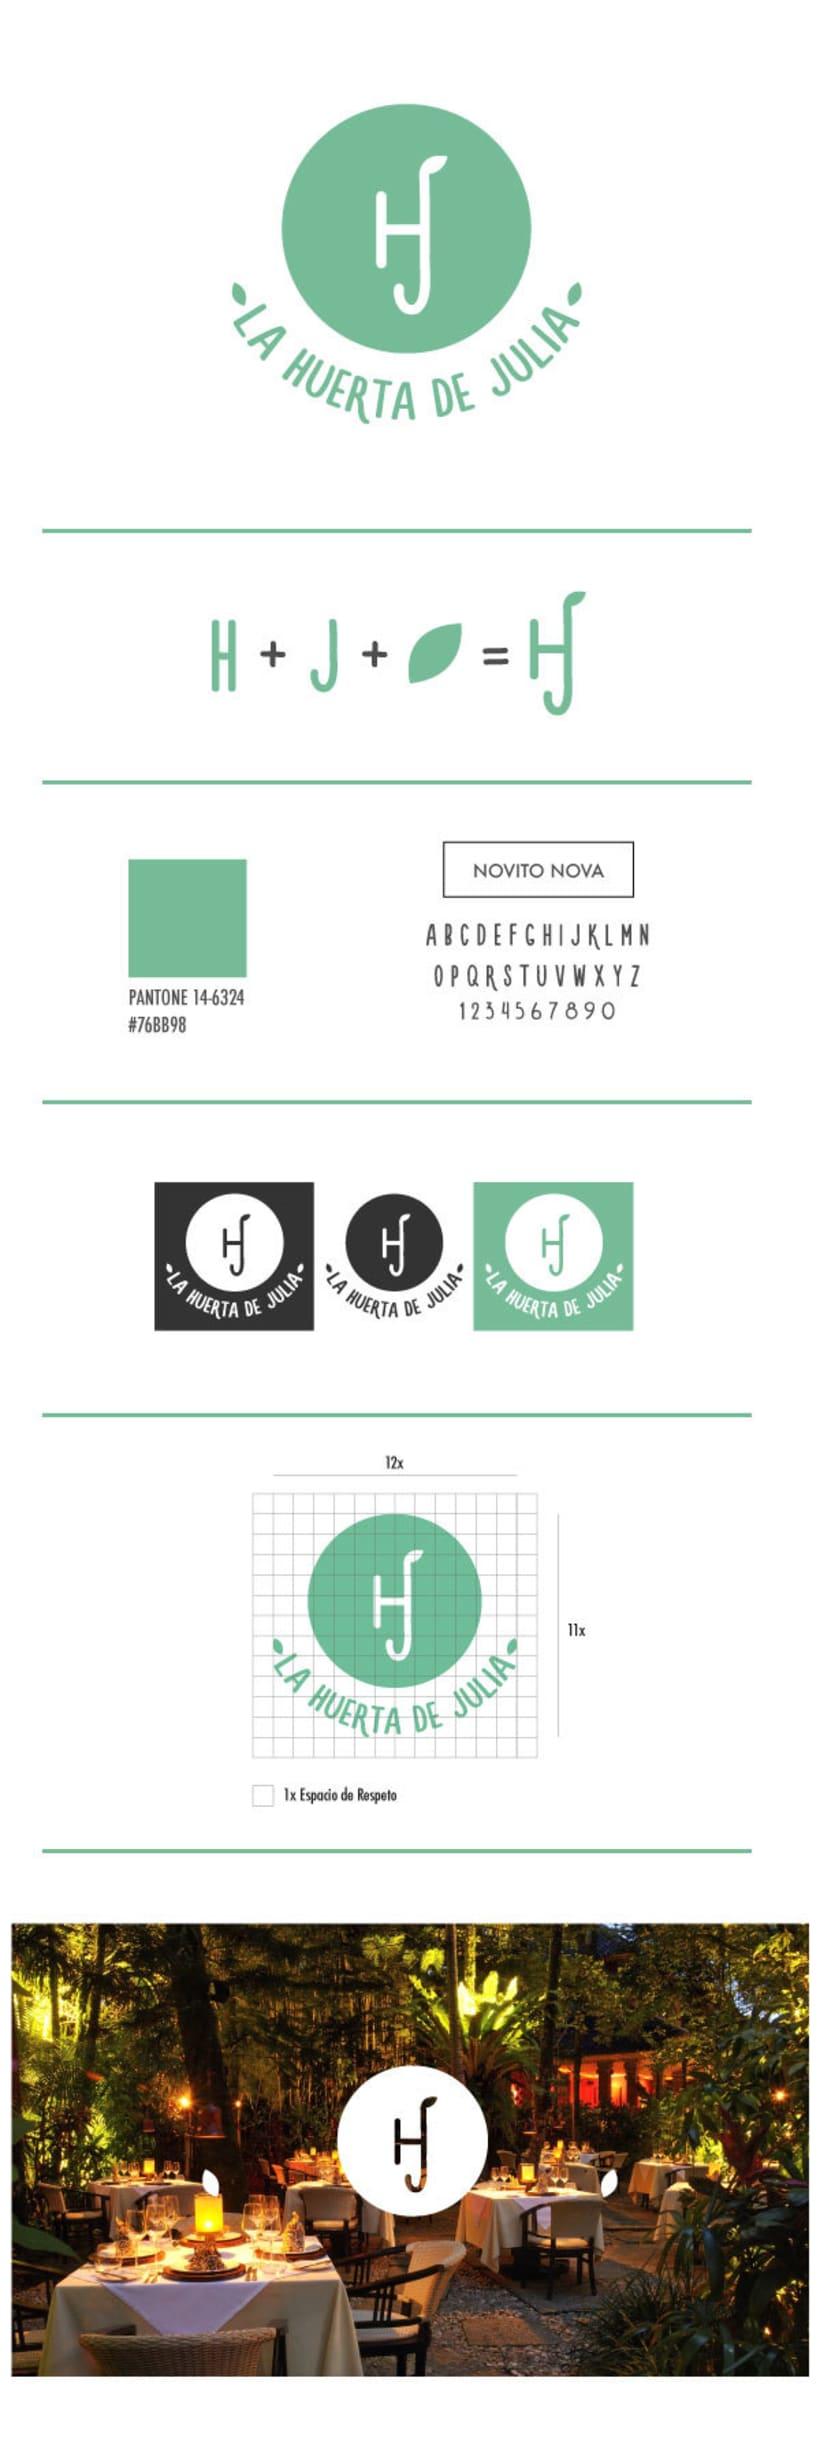 La Huerta de Julia - Identidad Corporativa -1